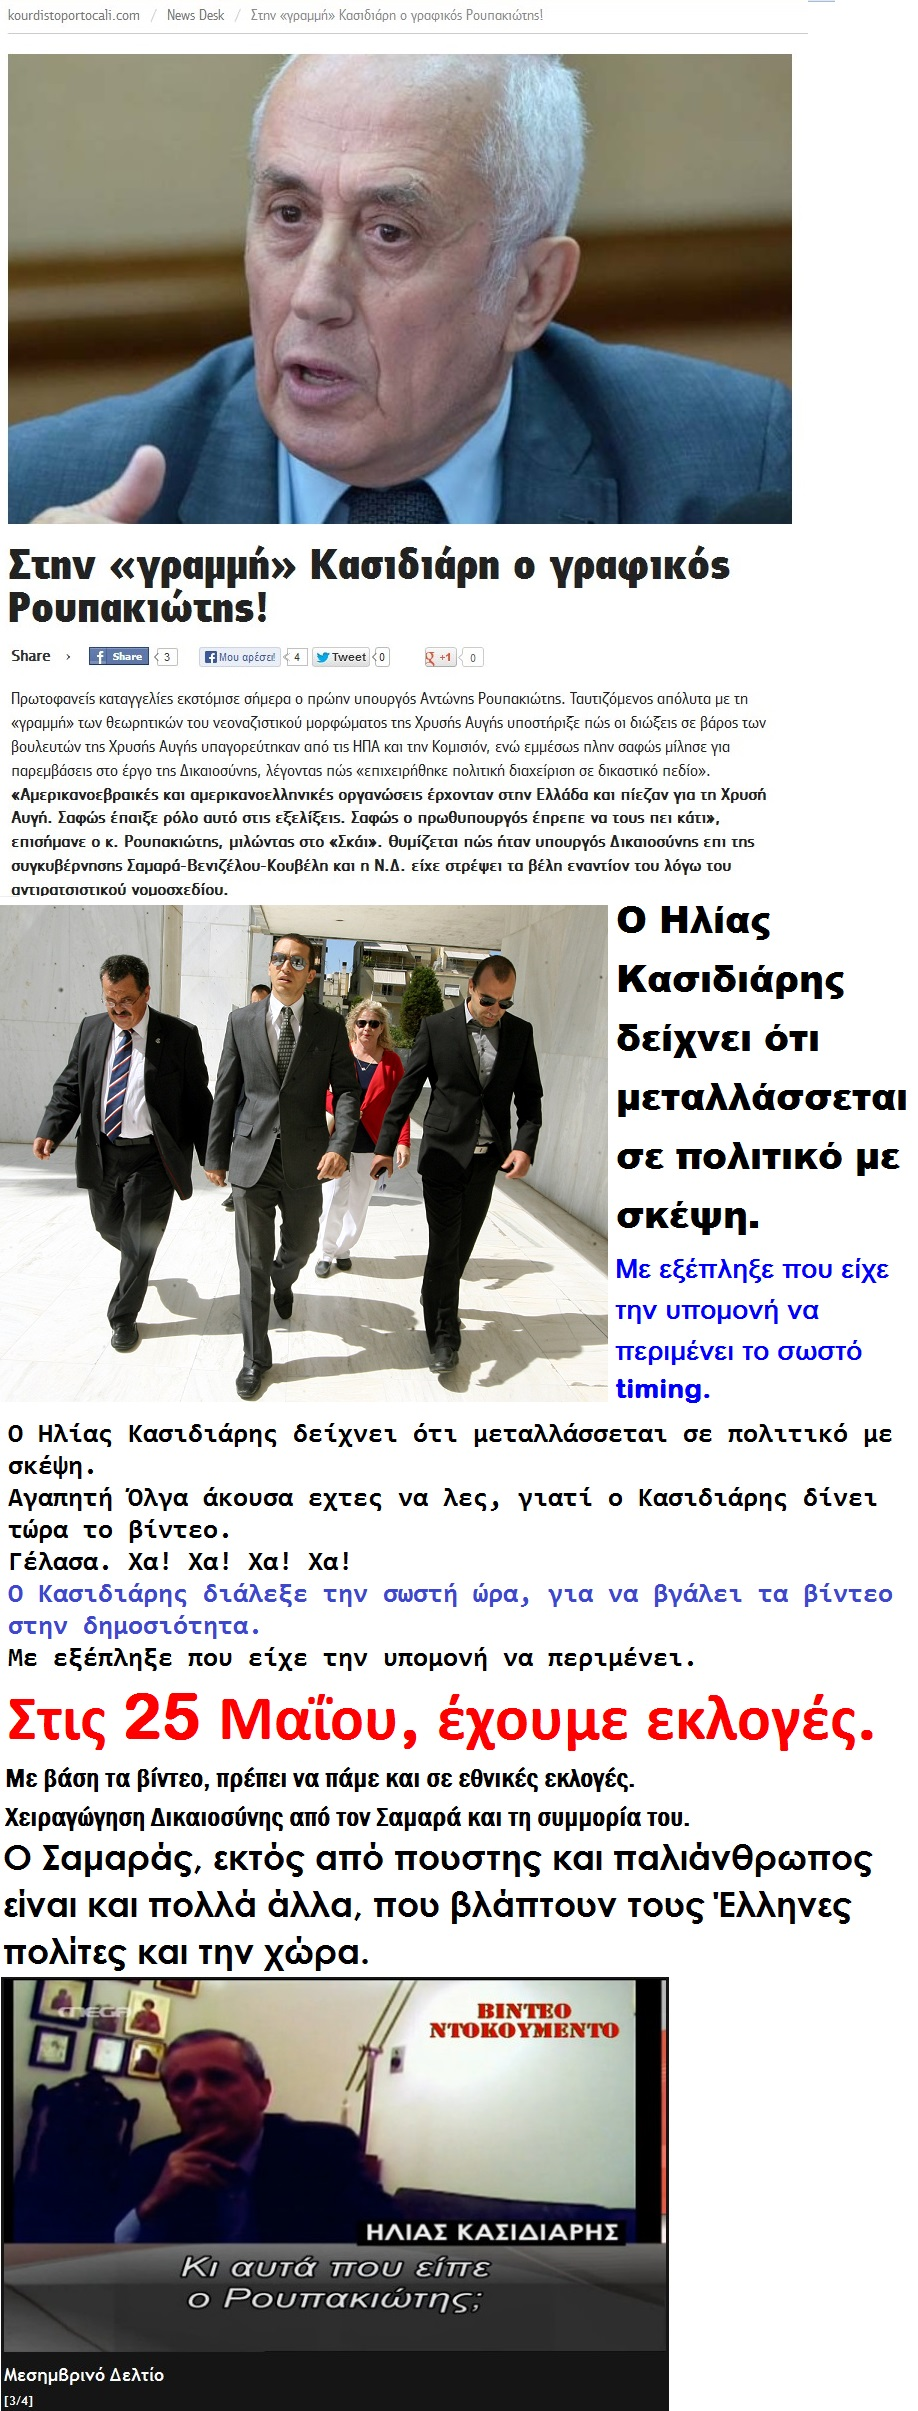 ELLADA BALTAKOS - KASIDIARHS - VIDEO - ROUPAKIOTHS XRISI AUGH 05 030414